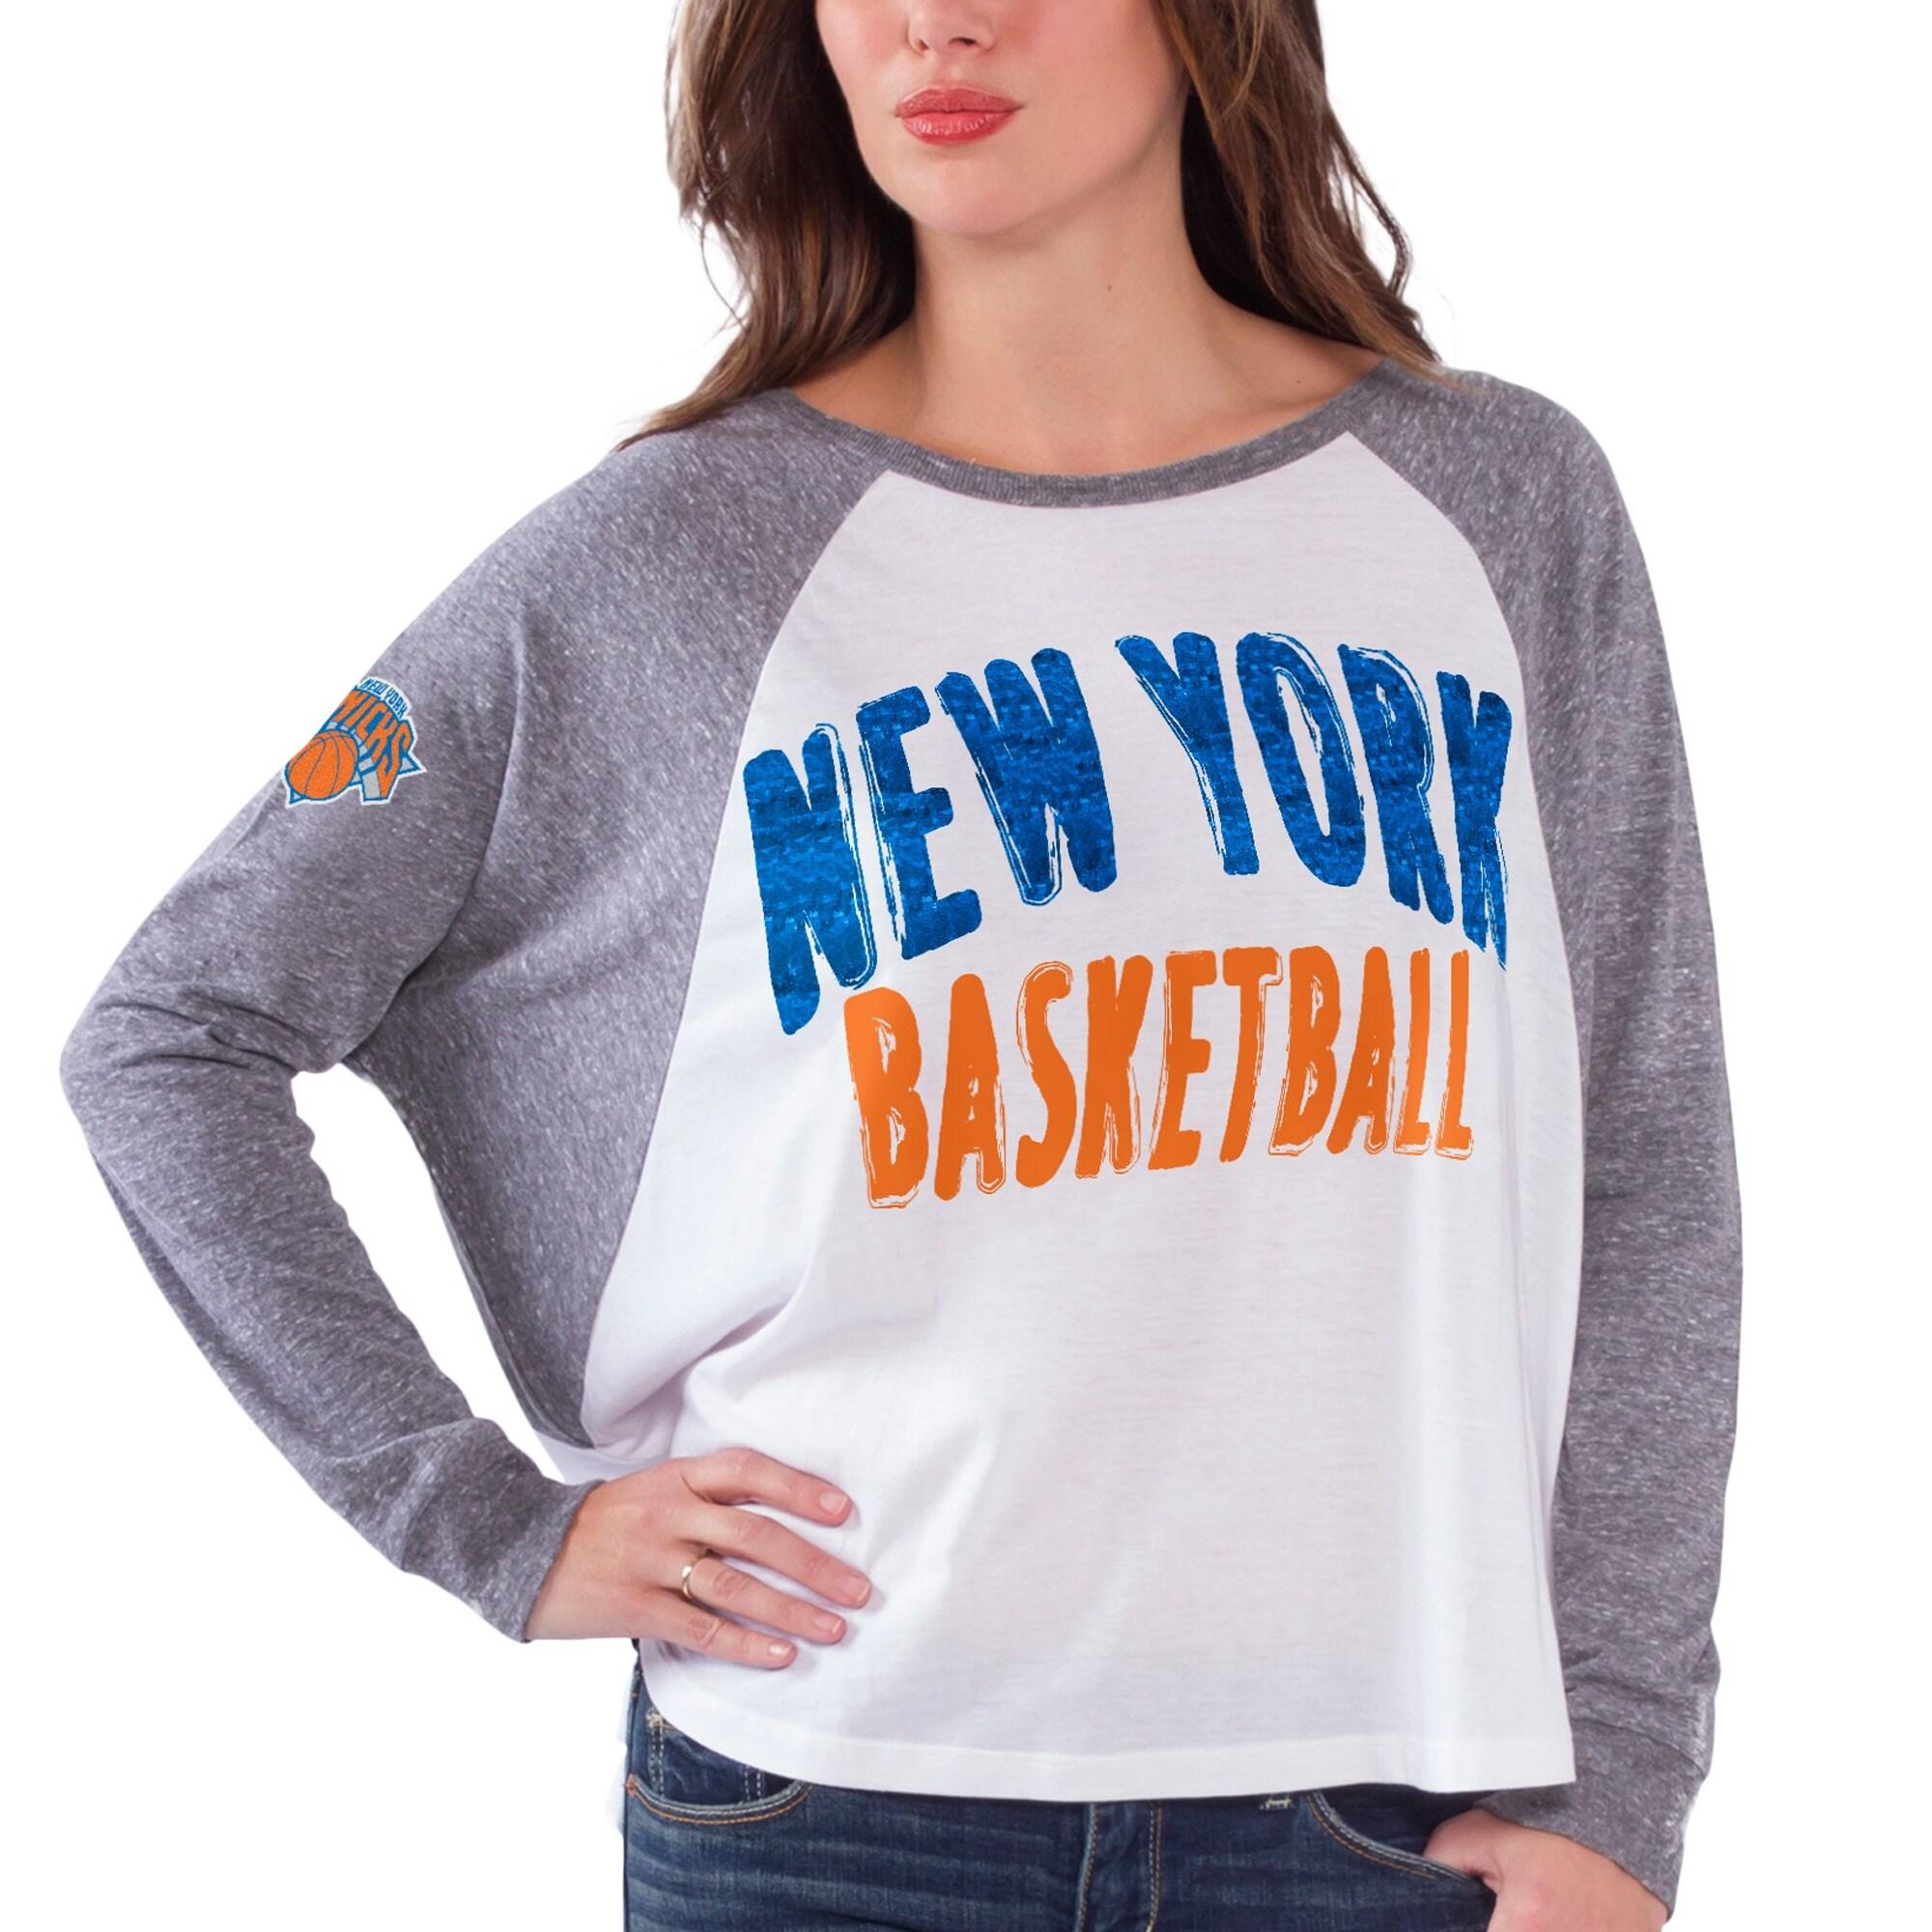 New York Knicks Women's Triple A Long Sleeve T-Shirt - White/Gray